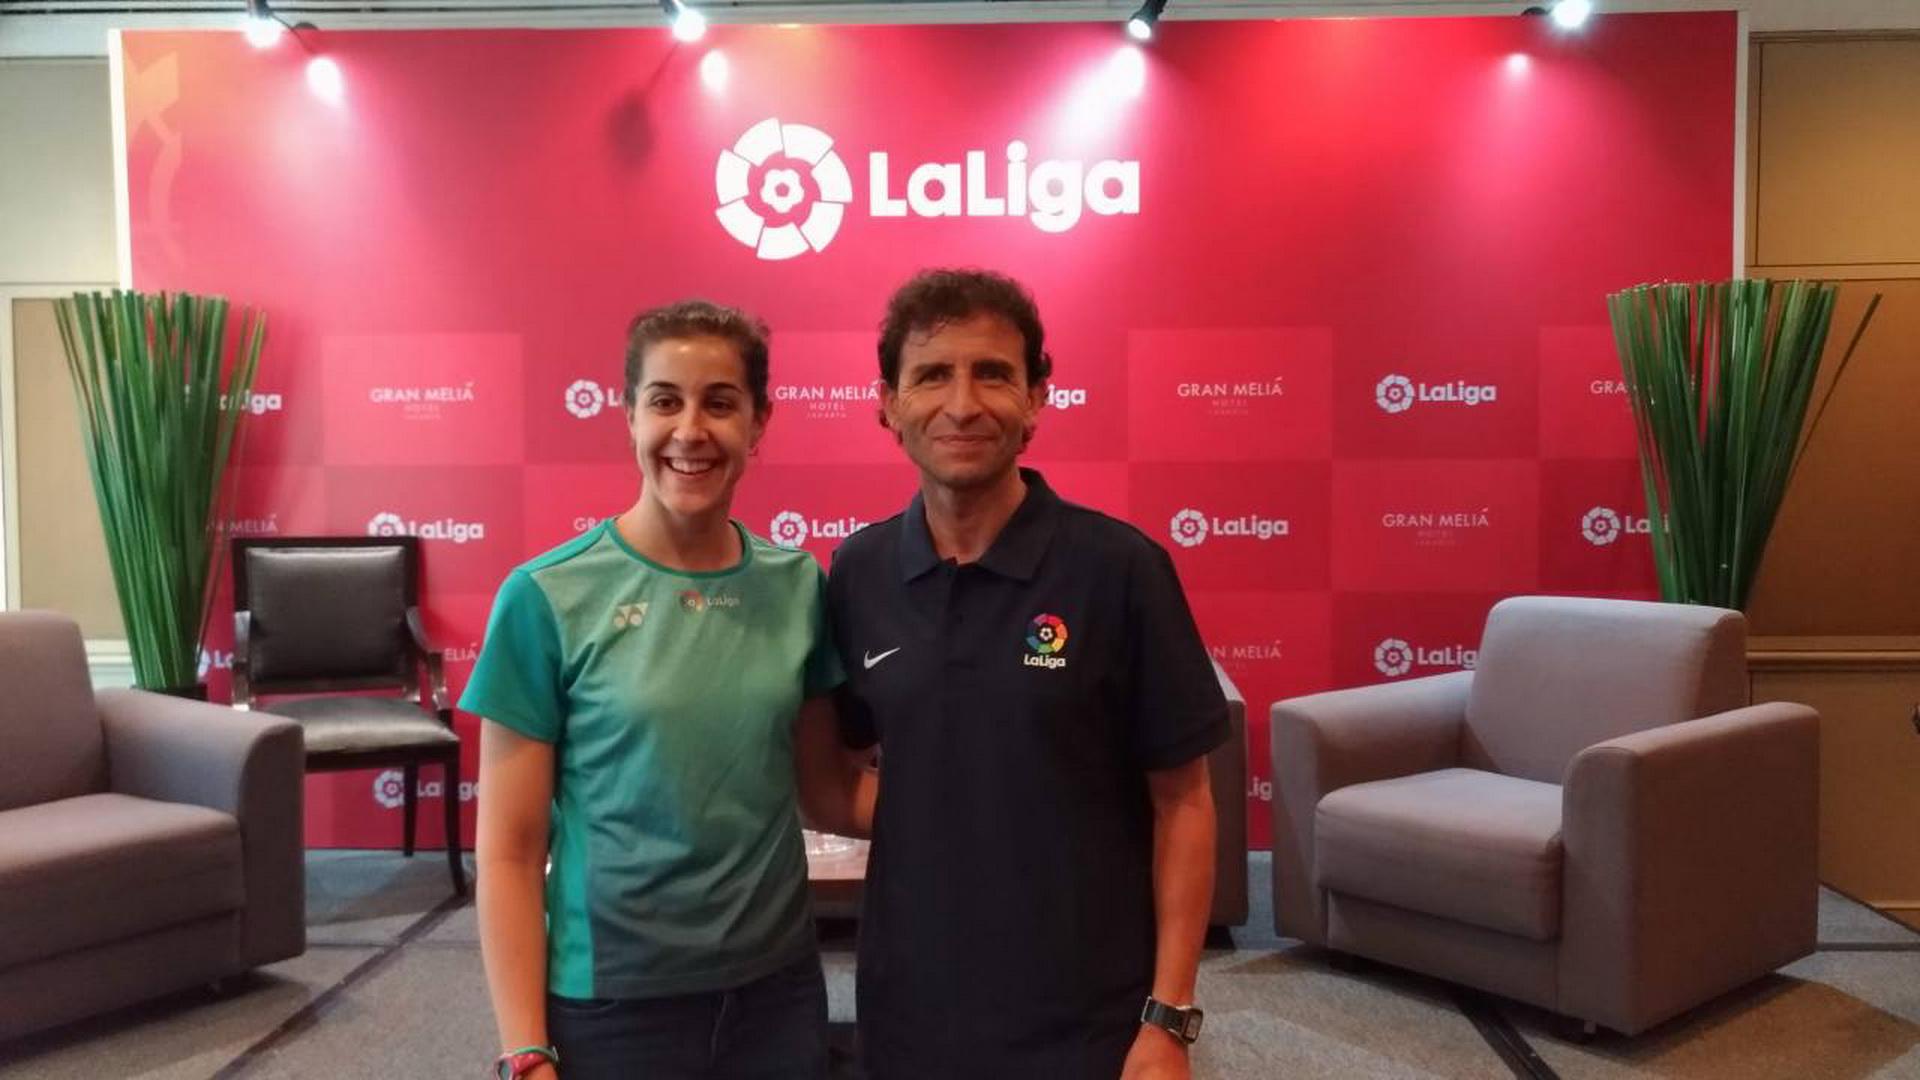 ¿Cuánto mide Luis Milla Aspas? La-liga-spanyol_8yoj6gzlbf9z17ros64uuccsk